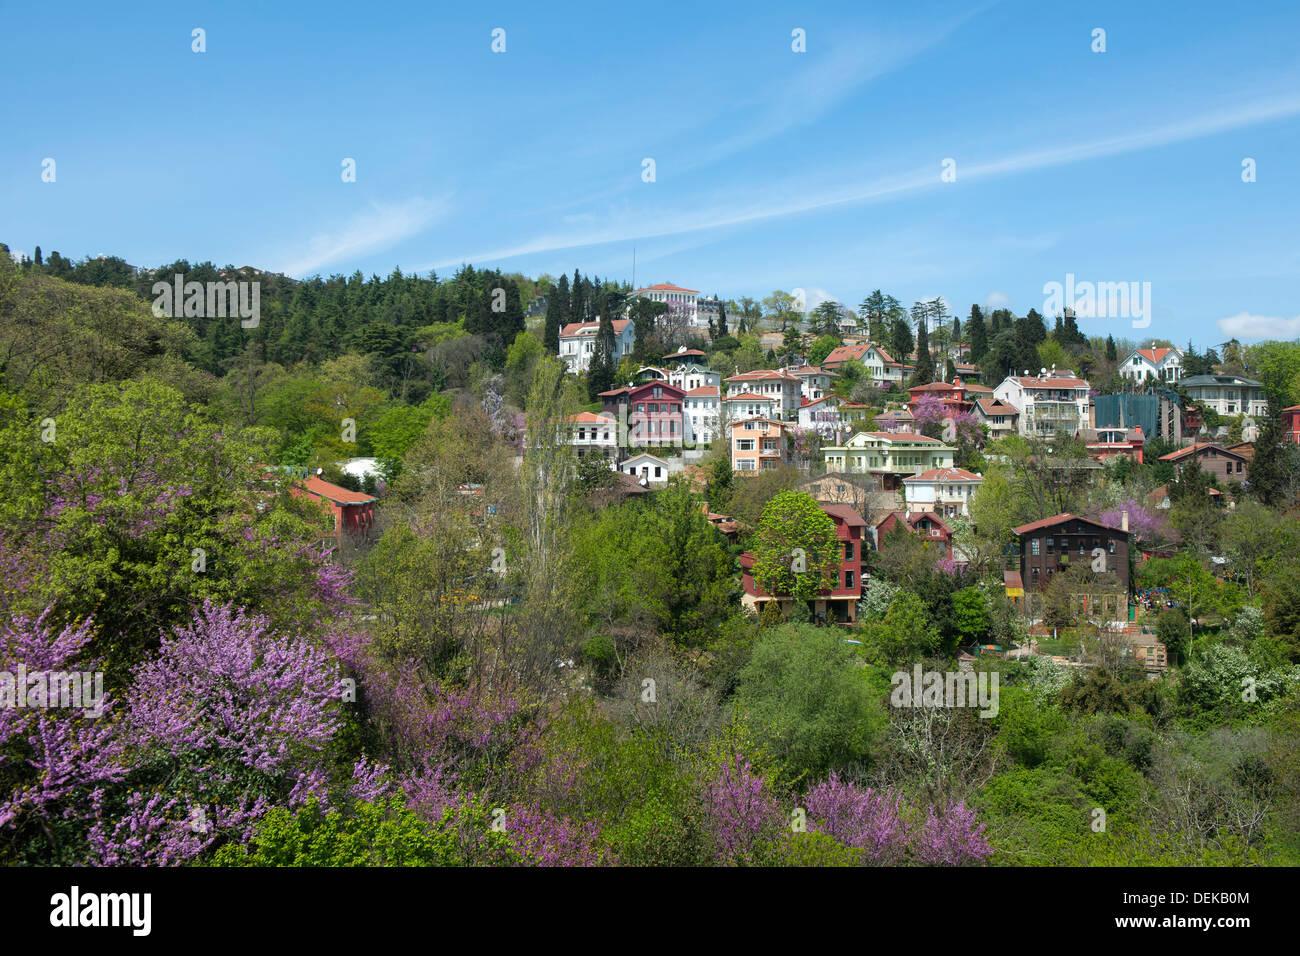 Istanbul, Sariyer, Rumelihisar, Wohnhäuser über der Burg - Stock Image